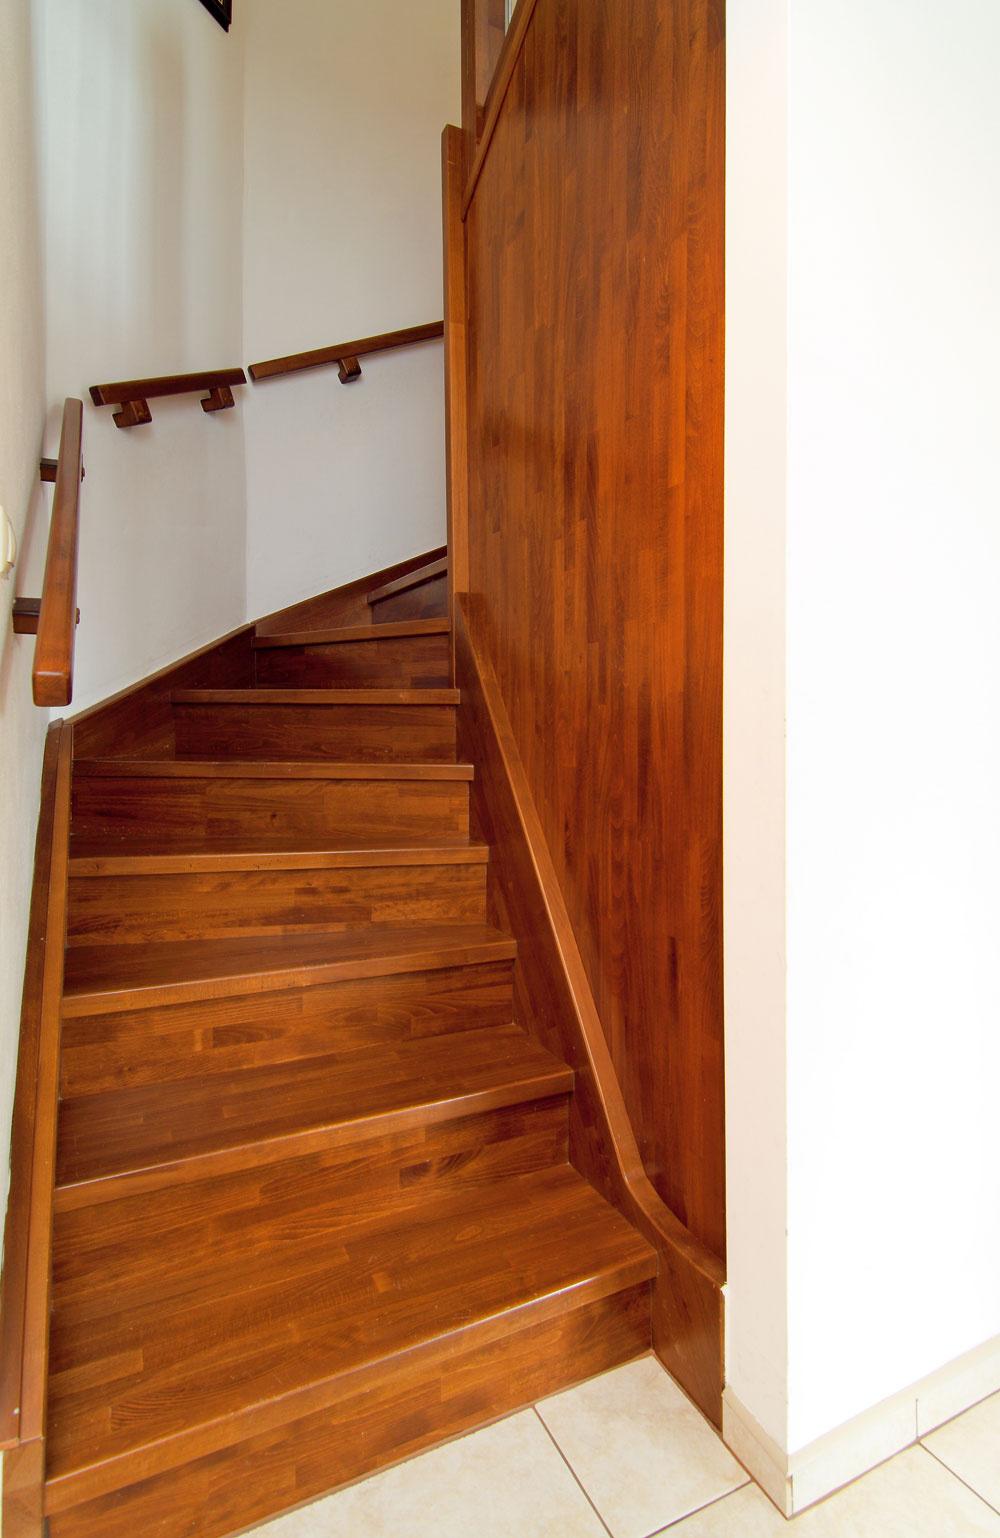 Pod dreveným schodiskom je ukrytá malá šatňa.